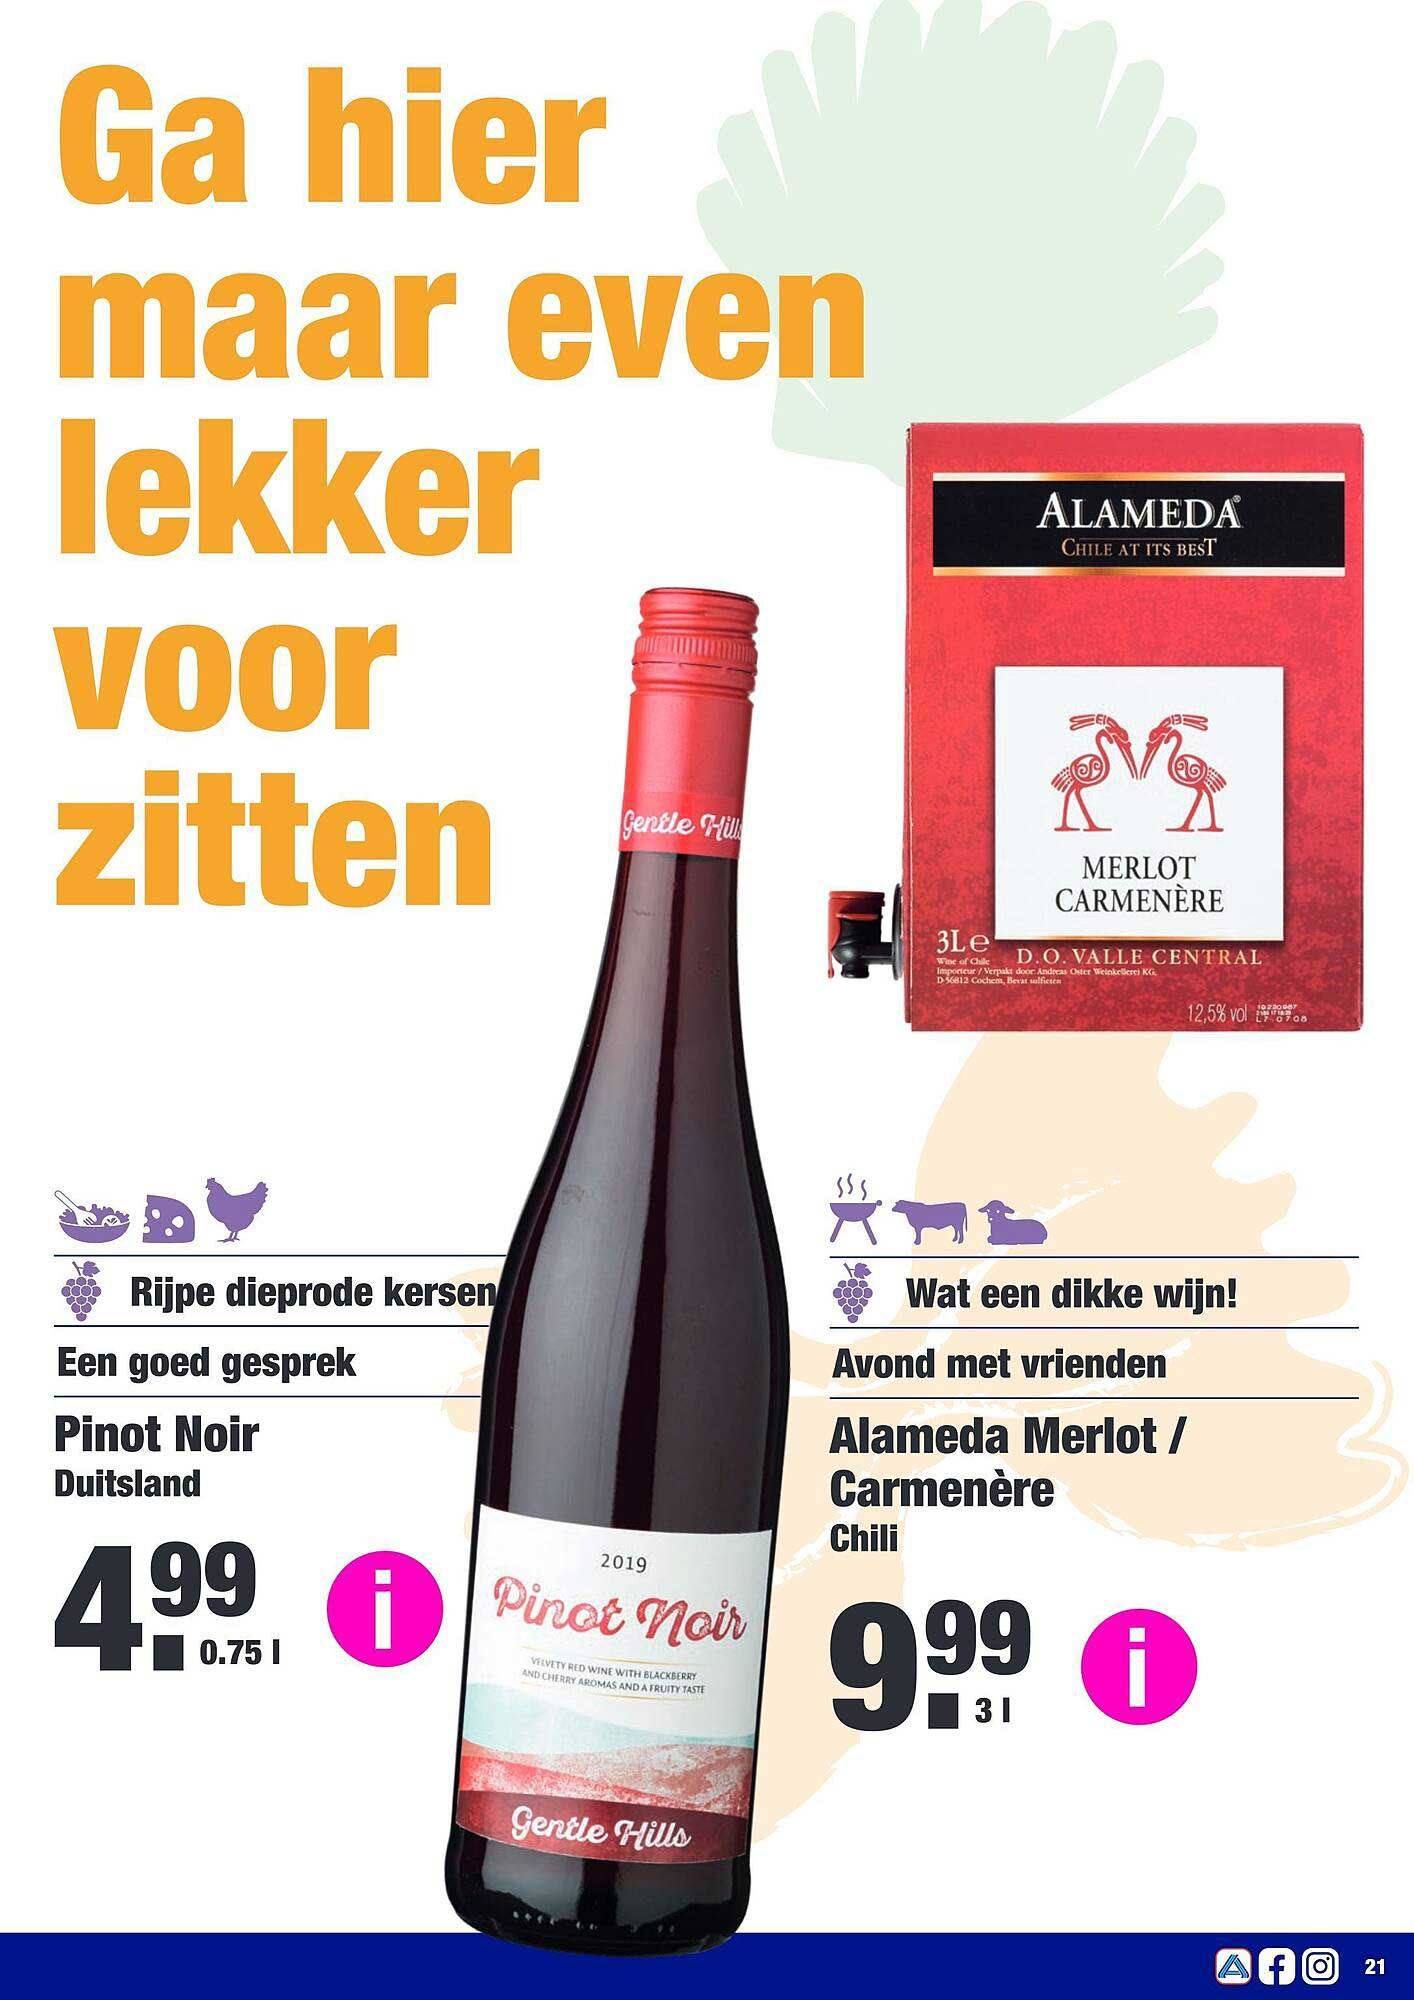 ALDI Pinot Noir